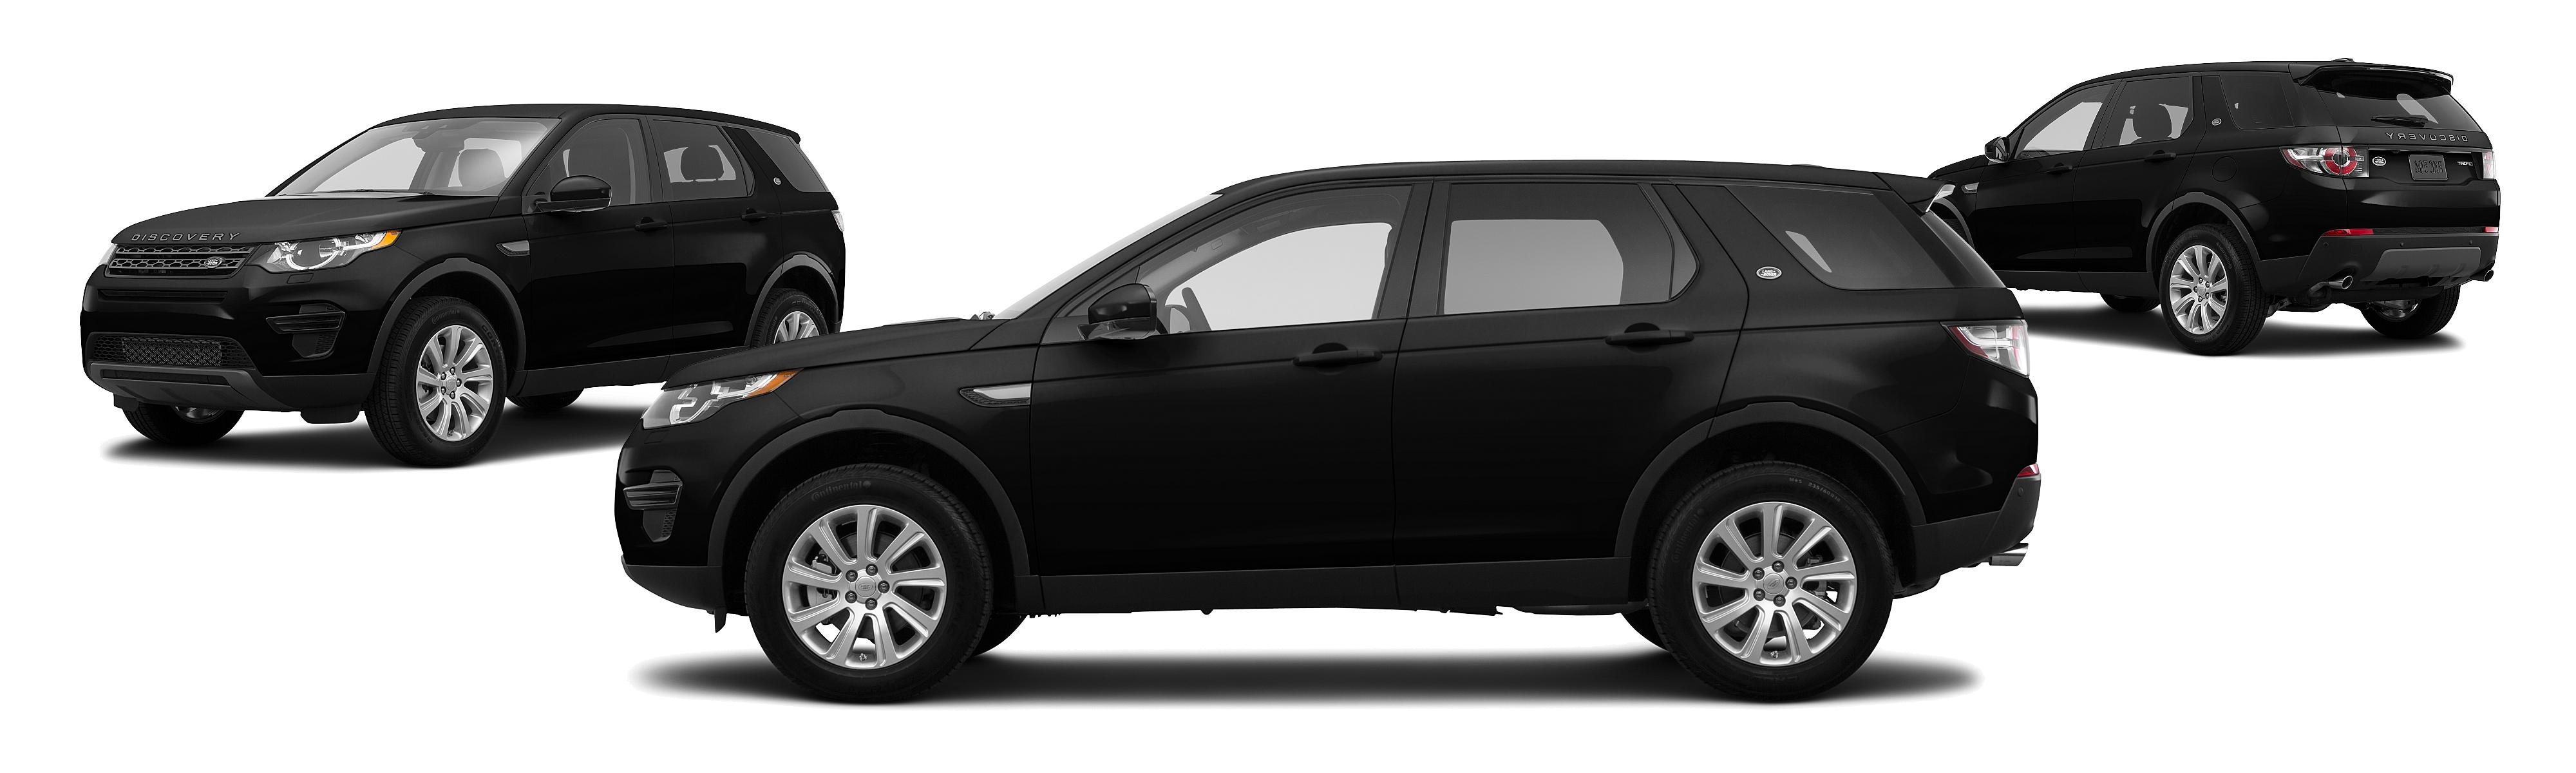 Land Rover Farmington Hills Mi >> Land Rover Farmington Hills New Upcoming Cars 2019 2020